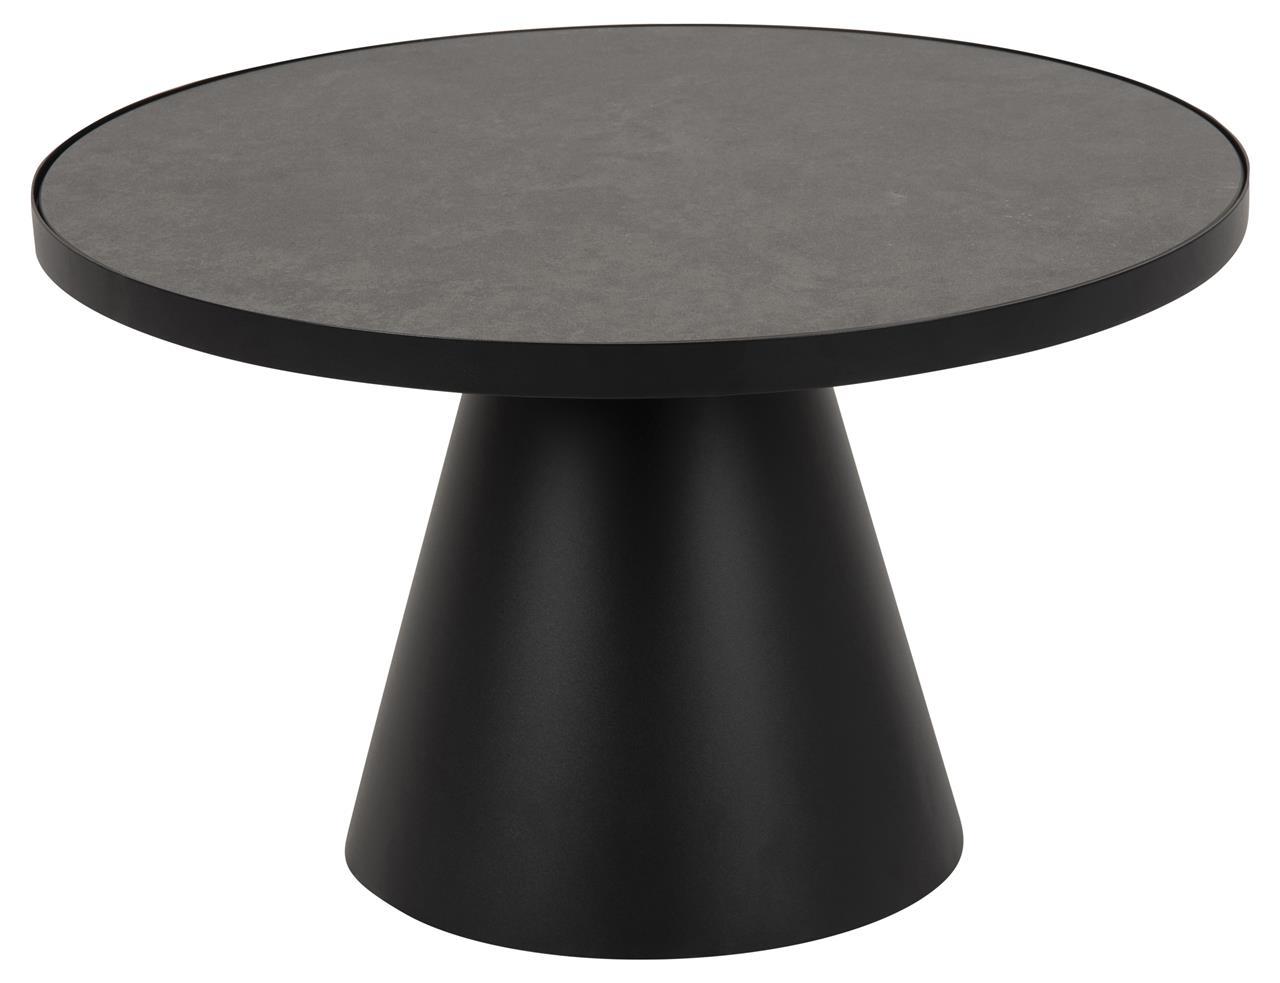 Masa Cafea Sticla Ceramica Metal Soli Negru